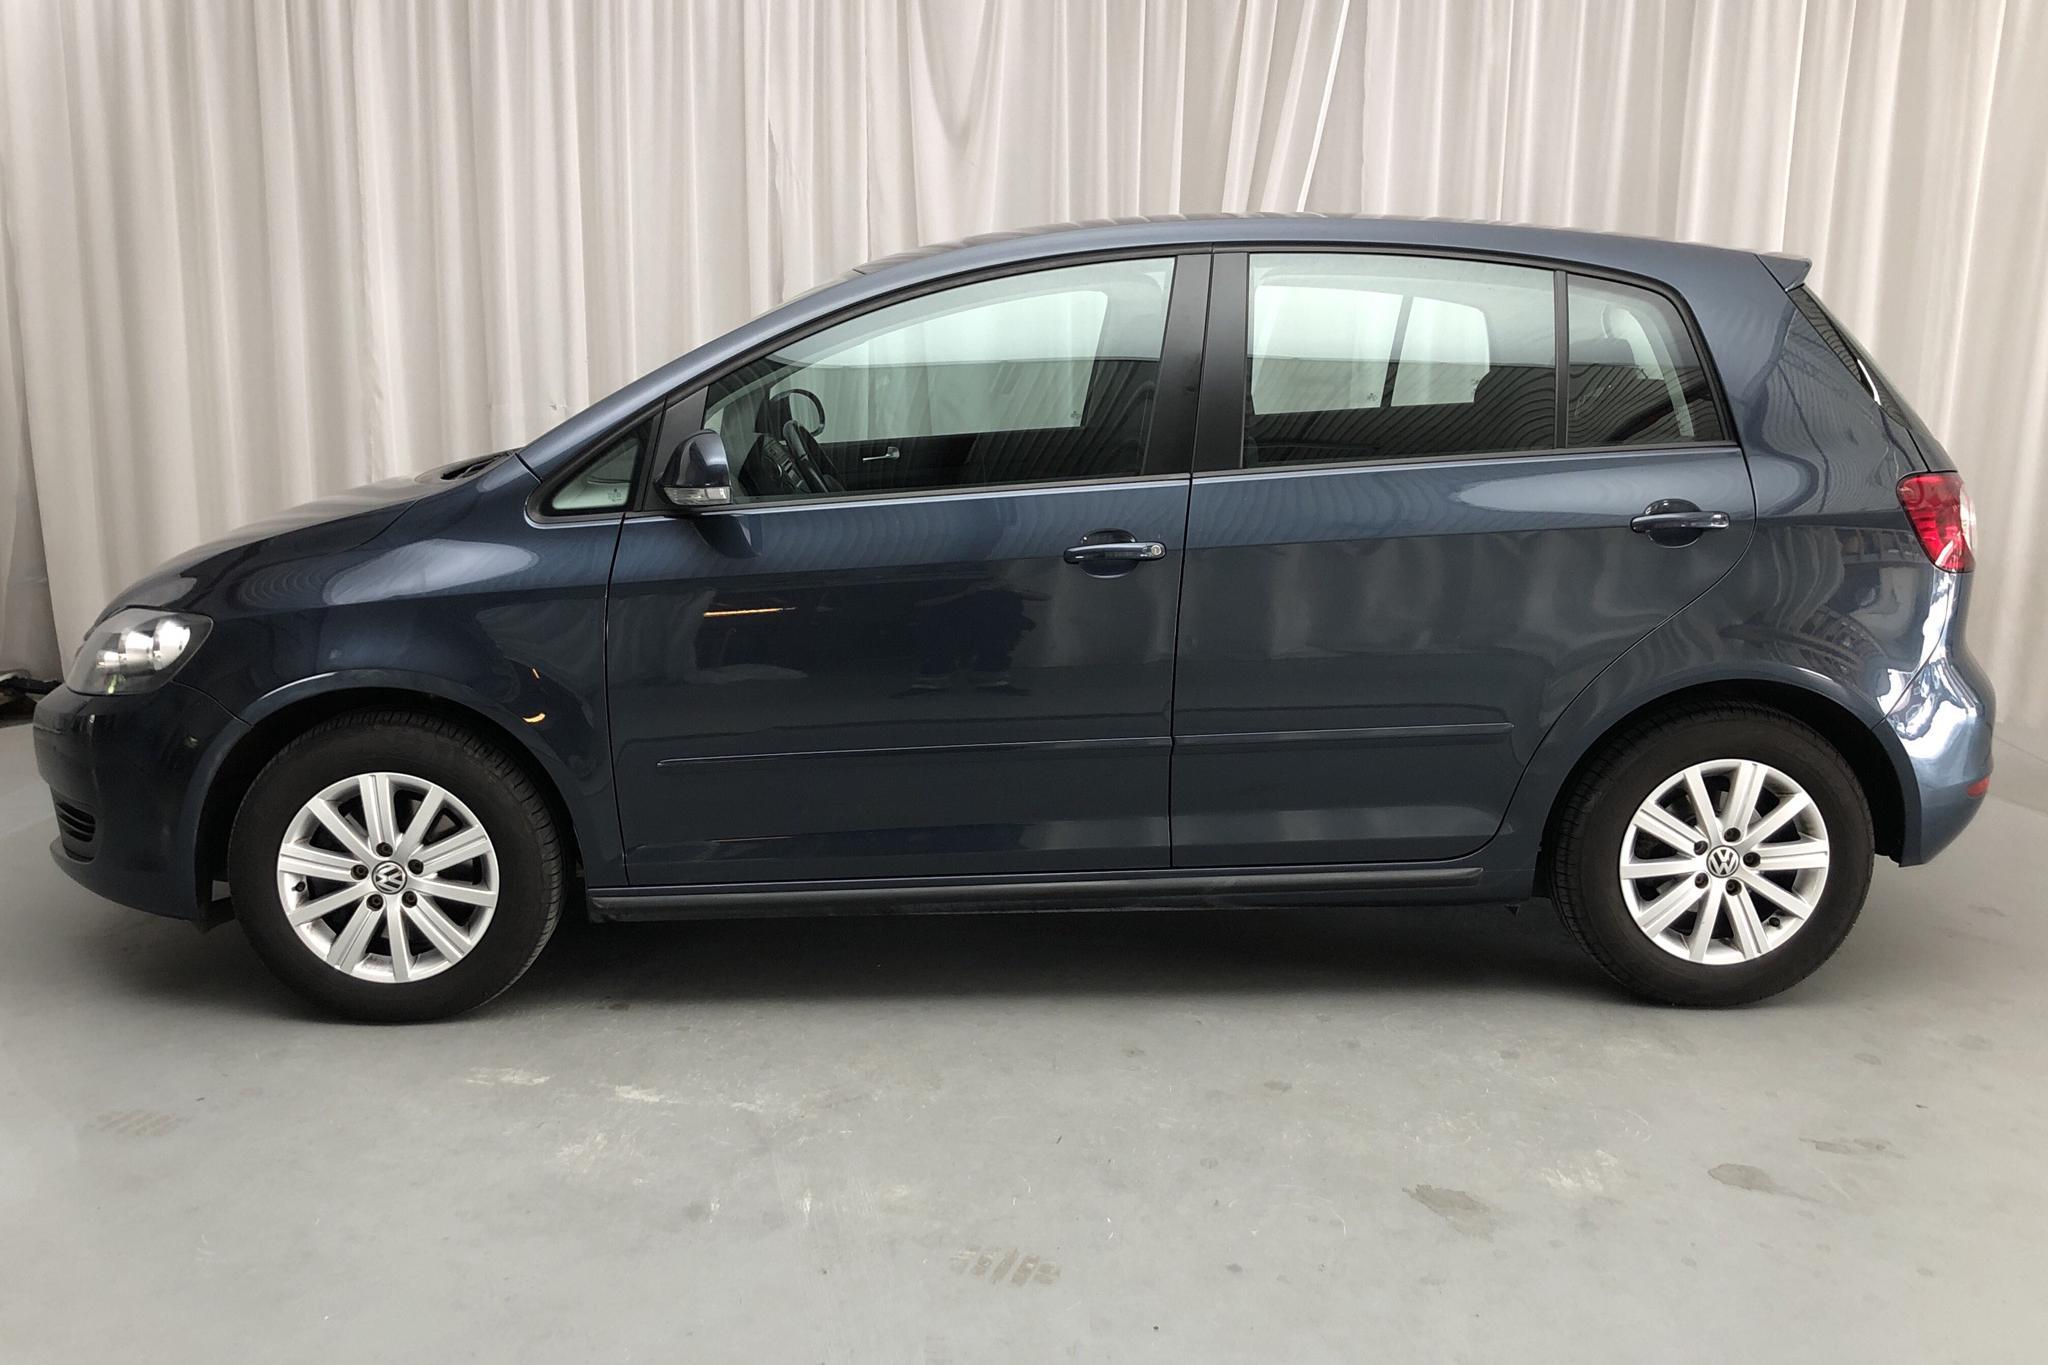 VW Golf VI 1.4 TSI Plus (122hk) - 13 468 mil - Automat - Dark Grey - 2011